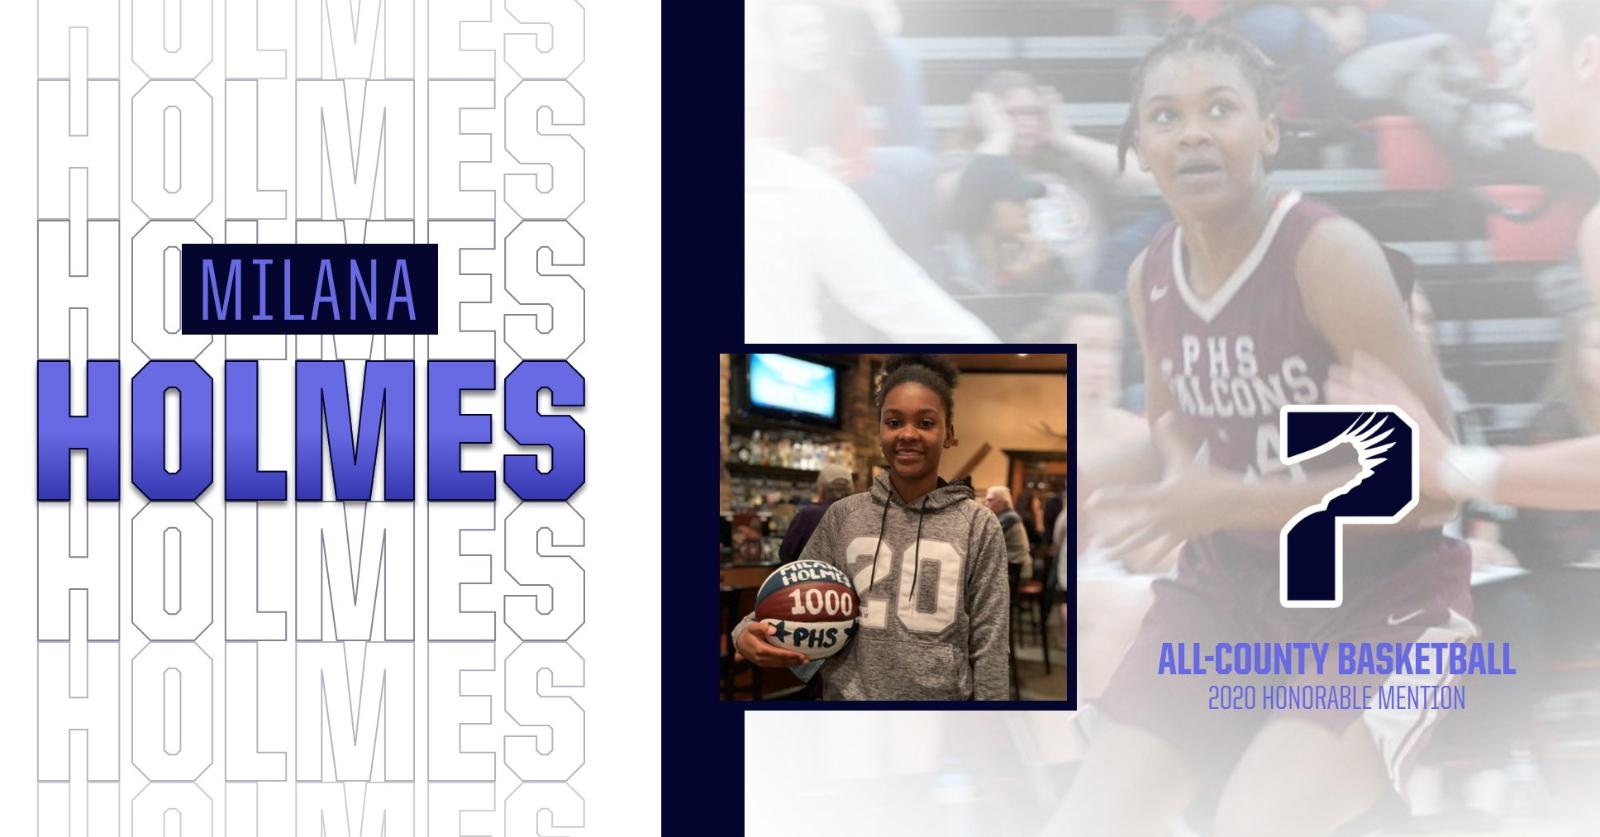 Milana Holmes Honored